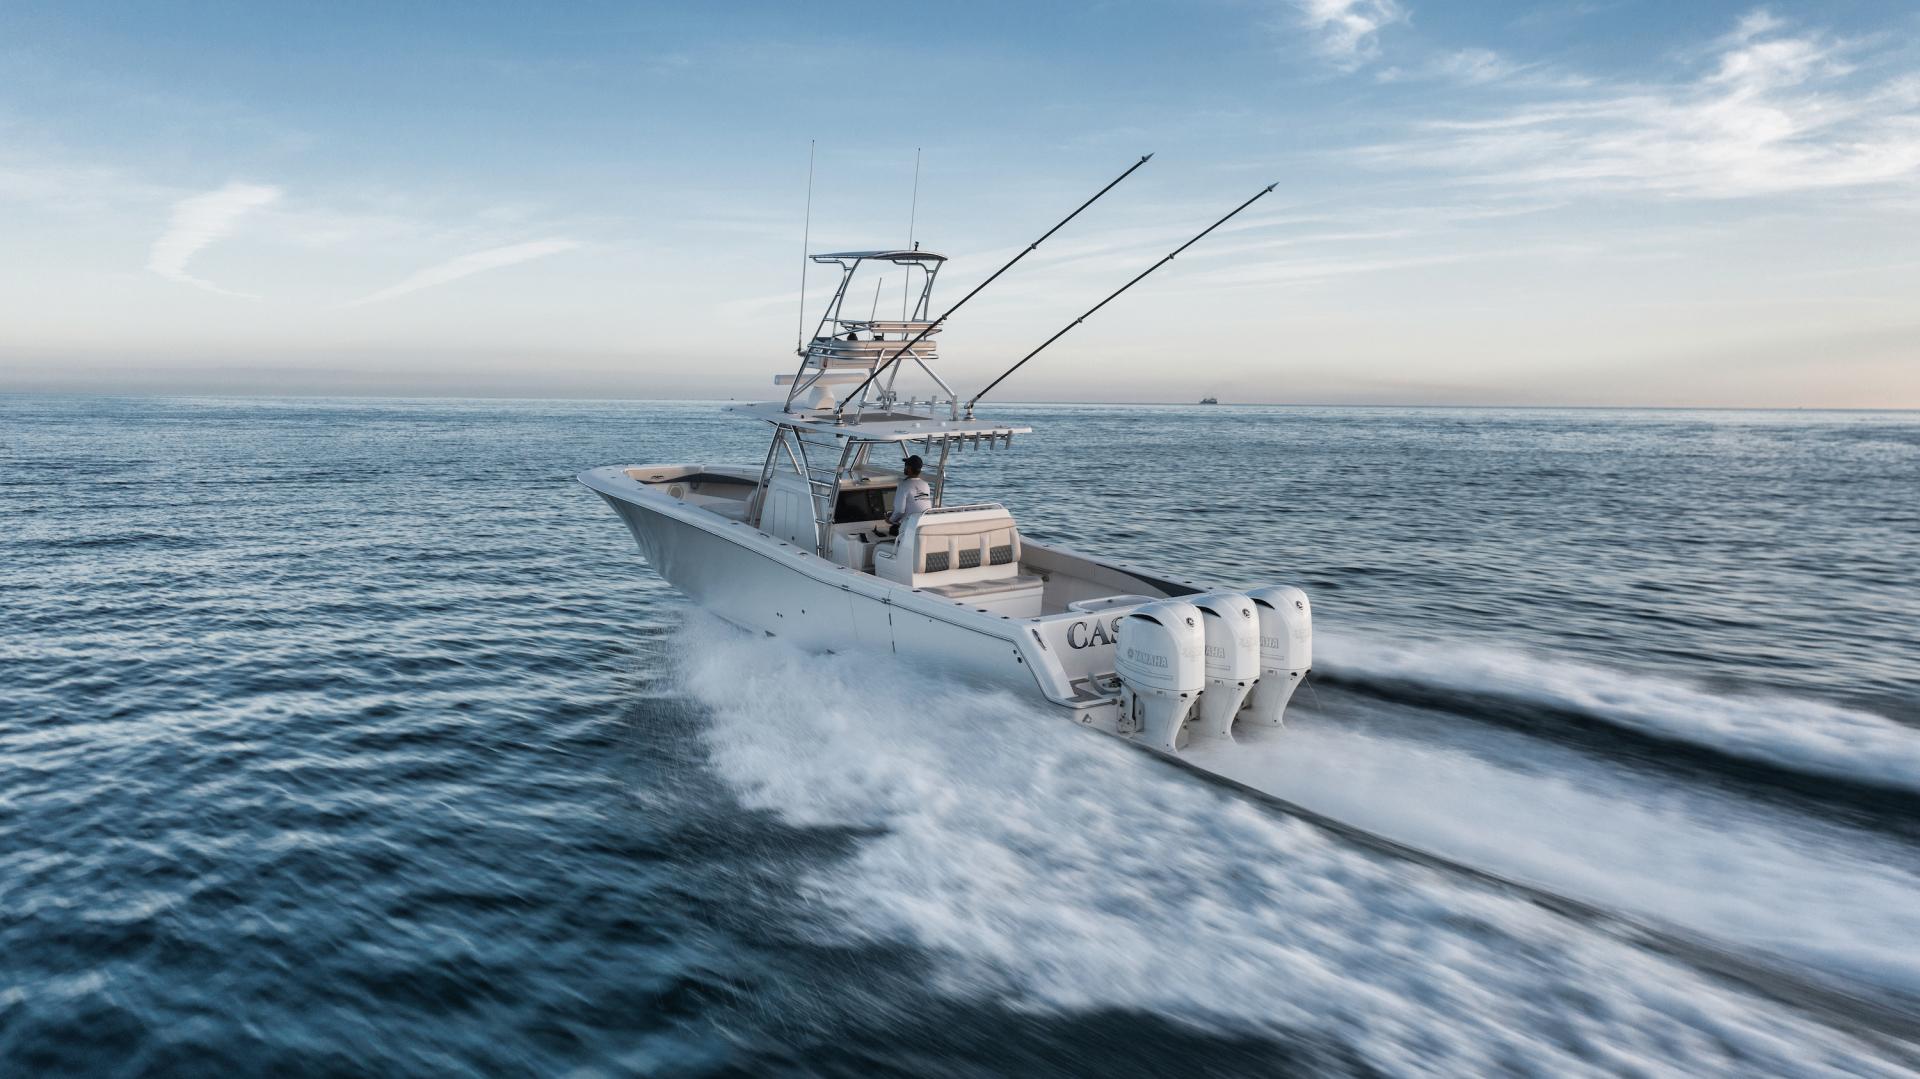 Invincible-Open Fisherman 2017-42 Invincible Jupiter-Florida-United States-1604173   Thumbnail